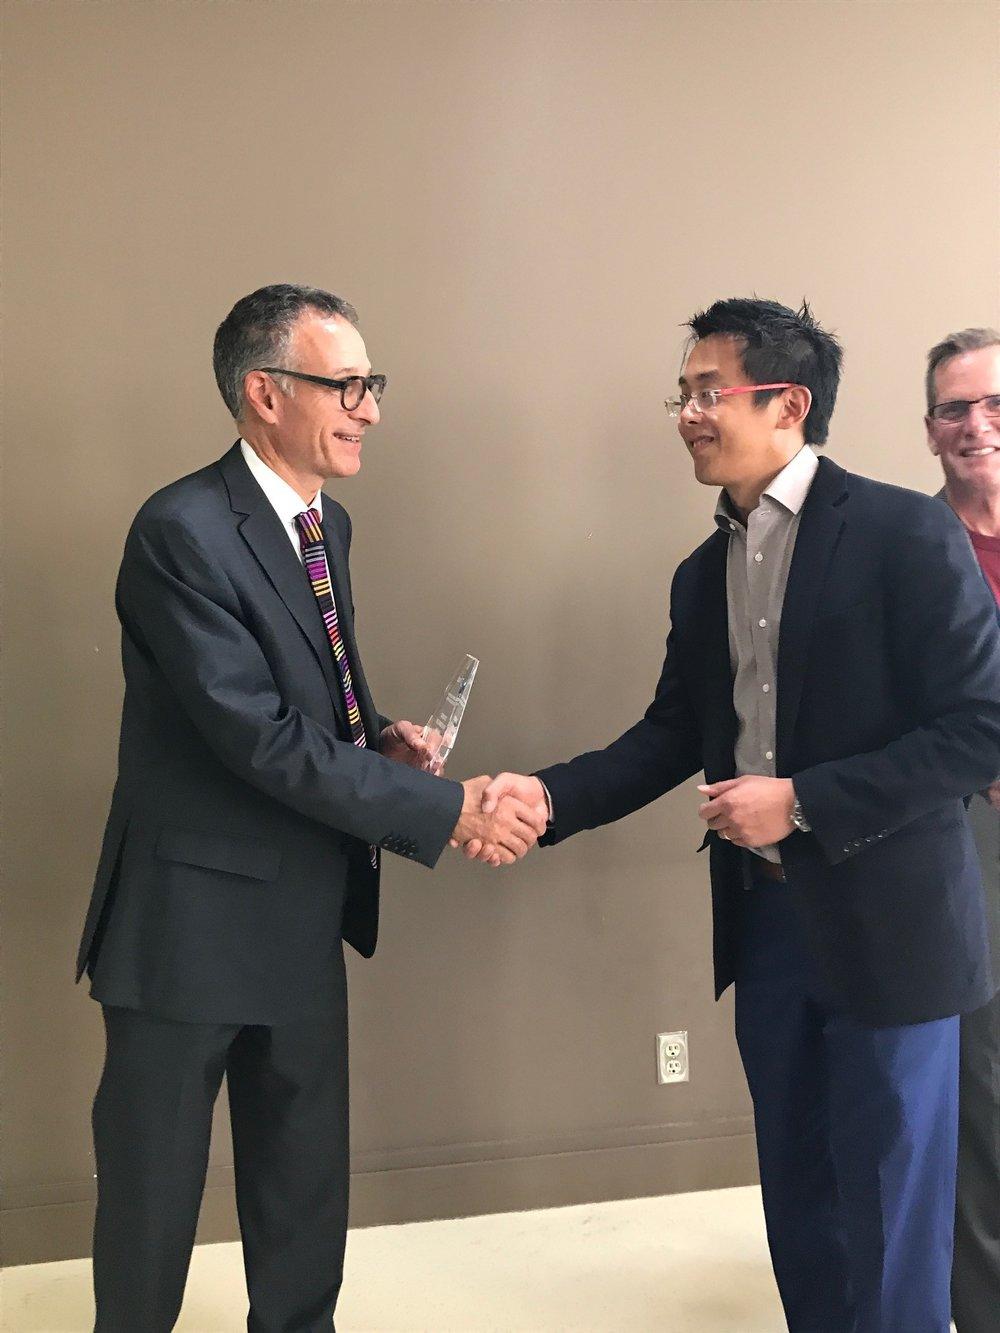 Dr. Gelfand & Dr. Chan.JPG